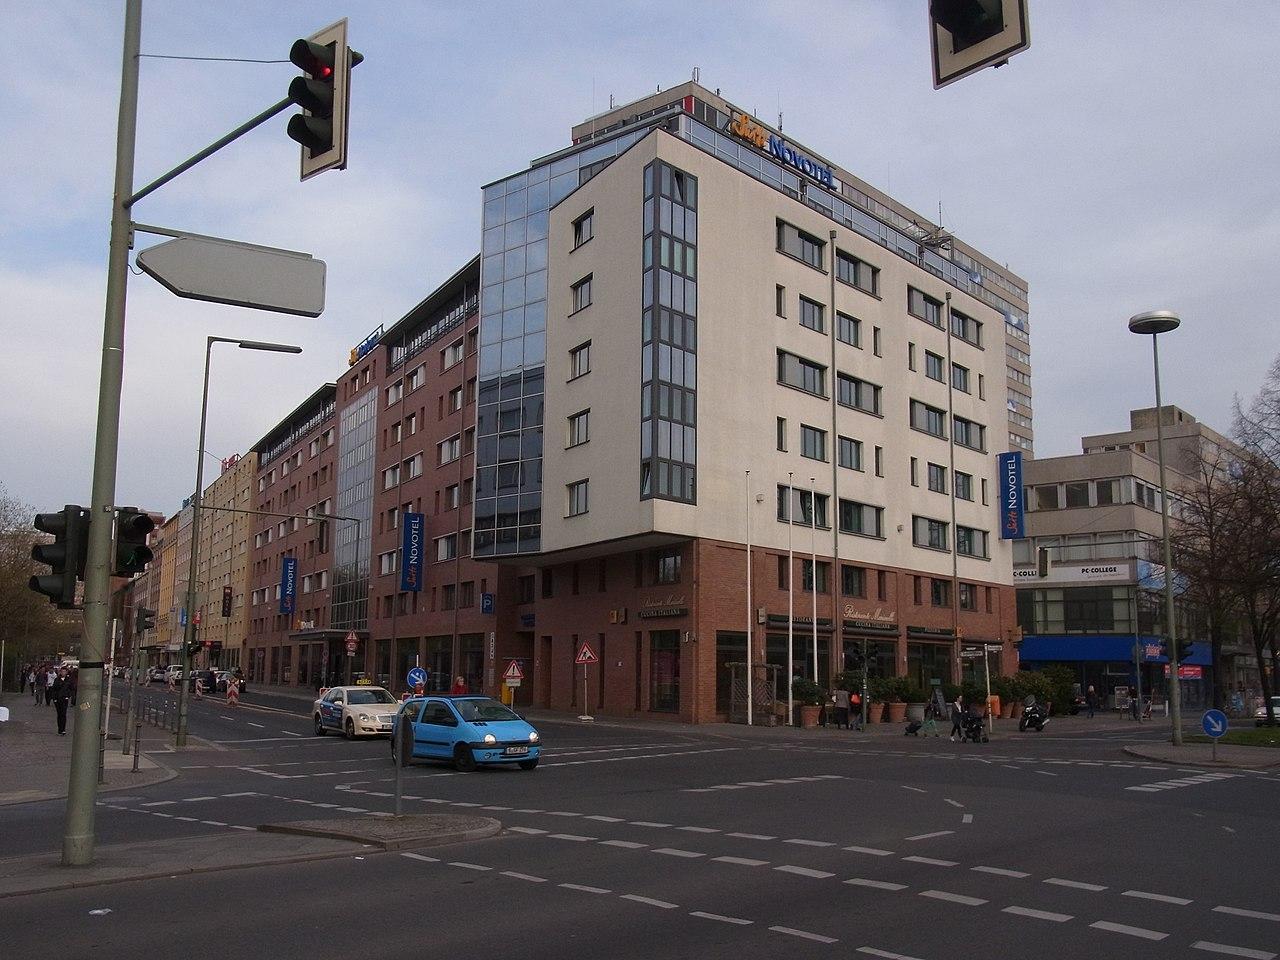 Hotel Berliner Hof Tauentzienstra Ef Bf Bde Berlin